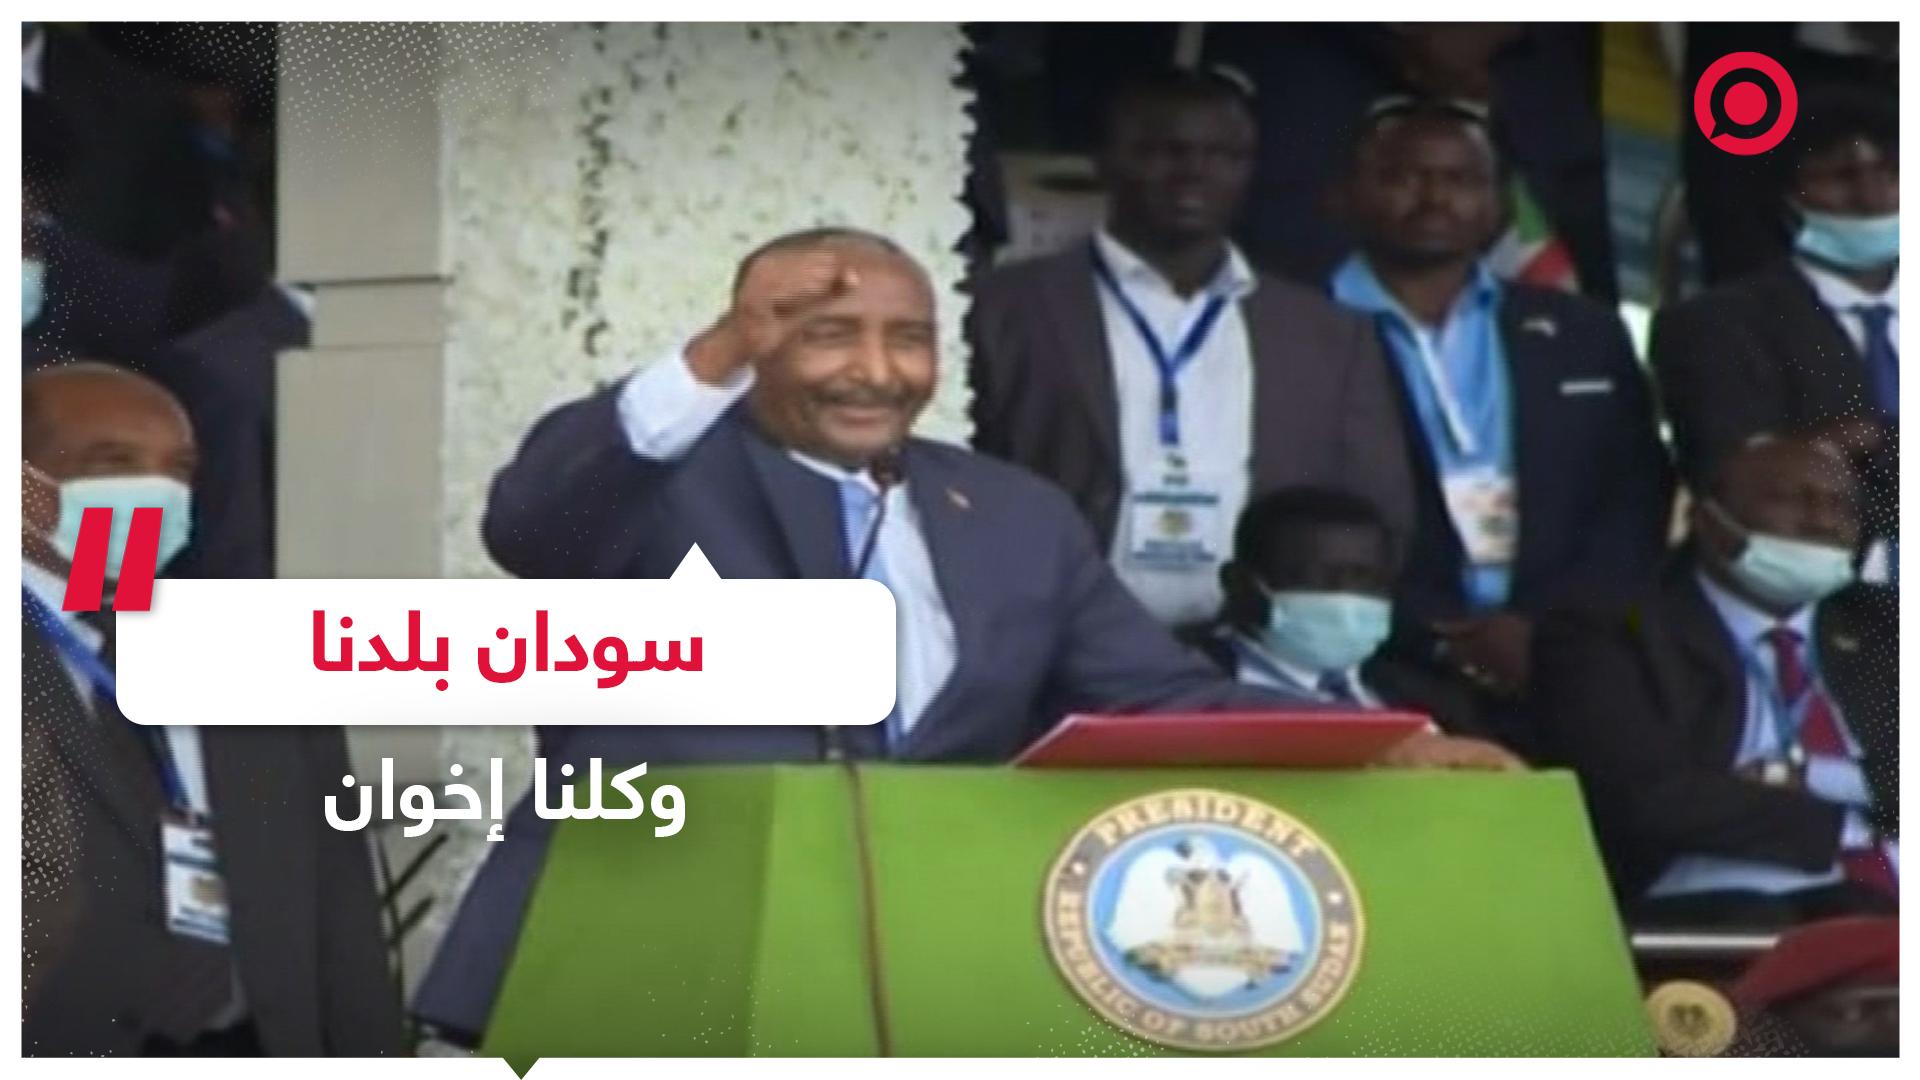 سودان بلدنا وكلنا إخوان